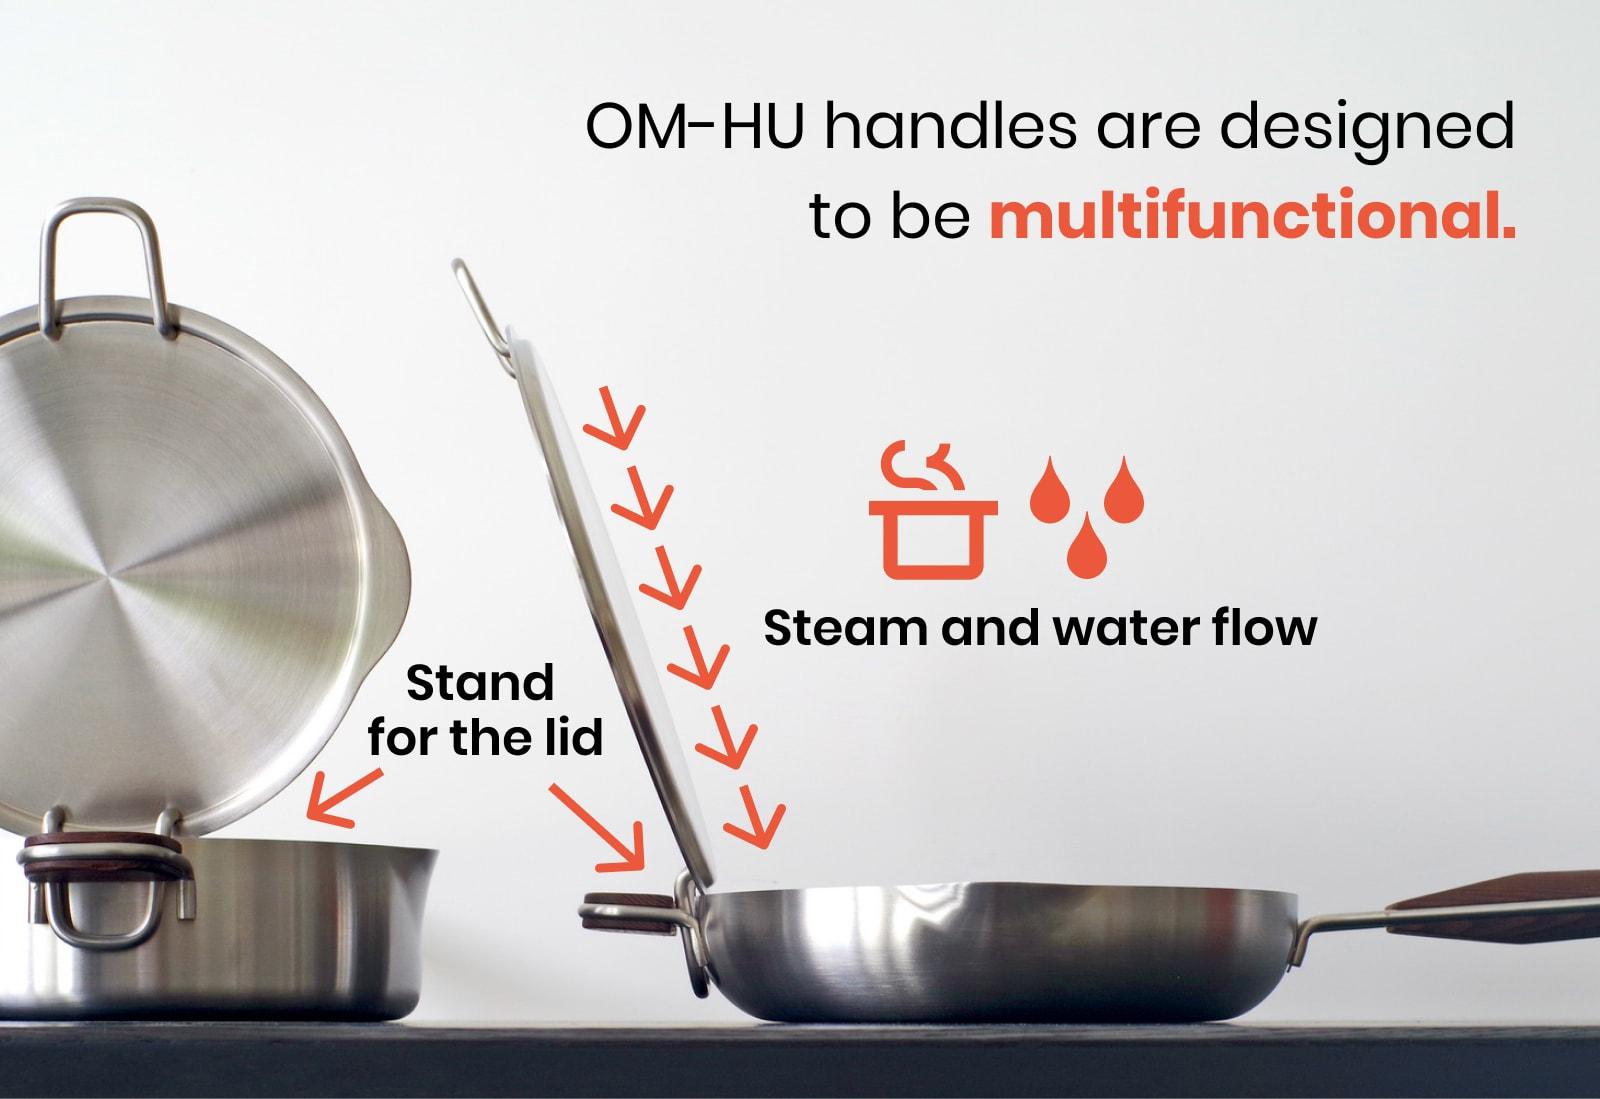 Mozow OM-HU handles serve as a lid holder.